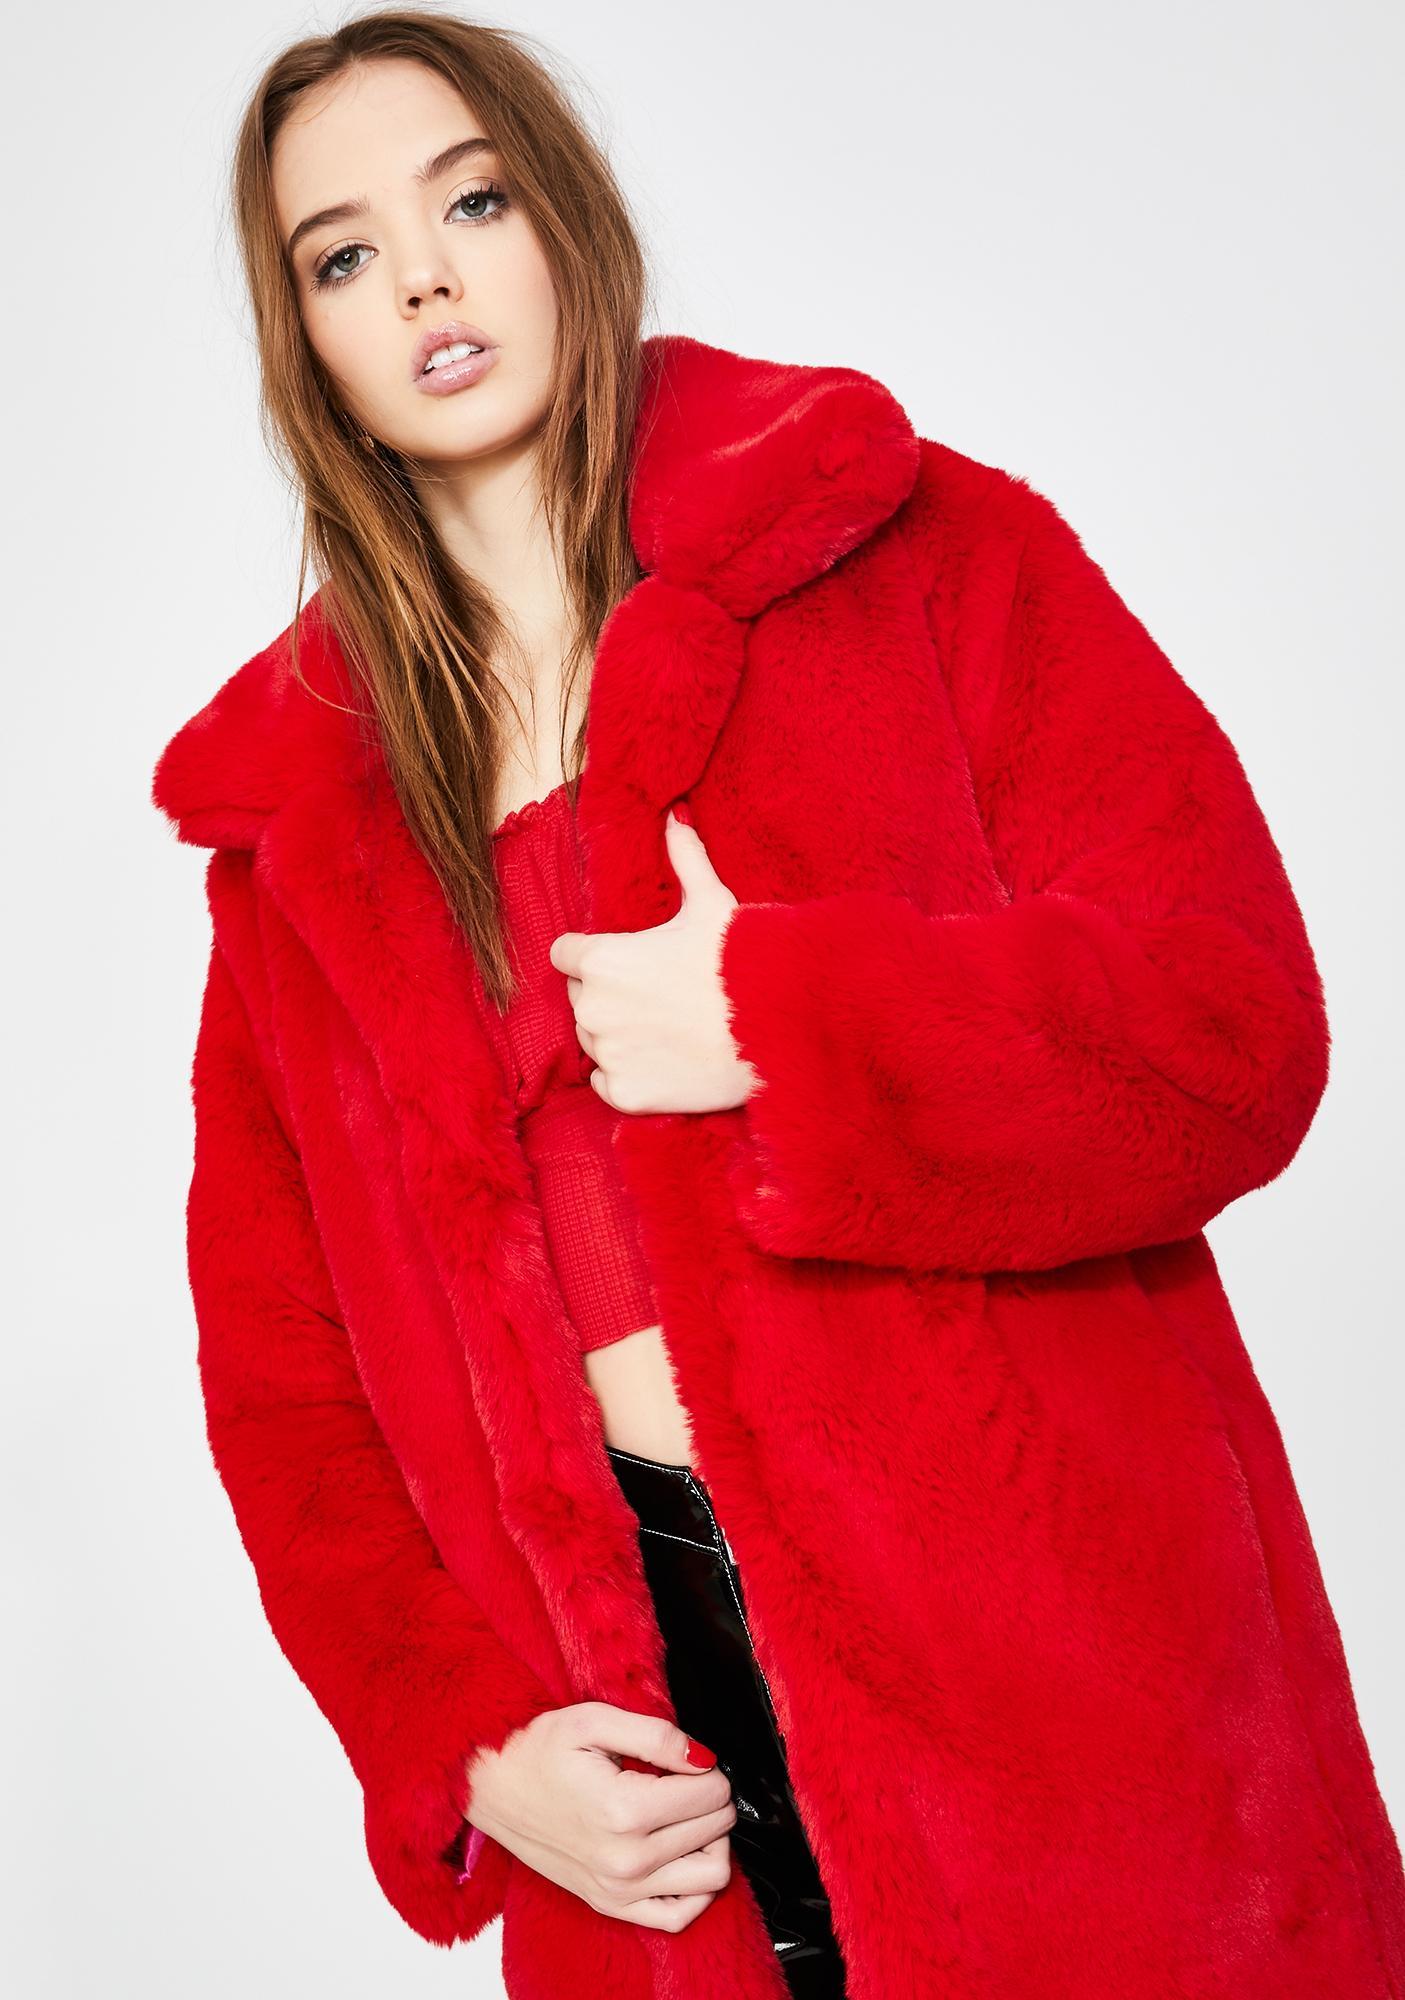 AZALEA WANG Dayanne Long Coat